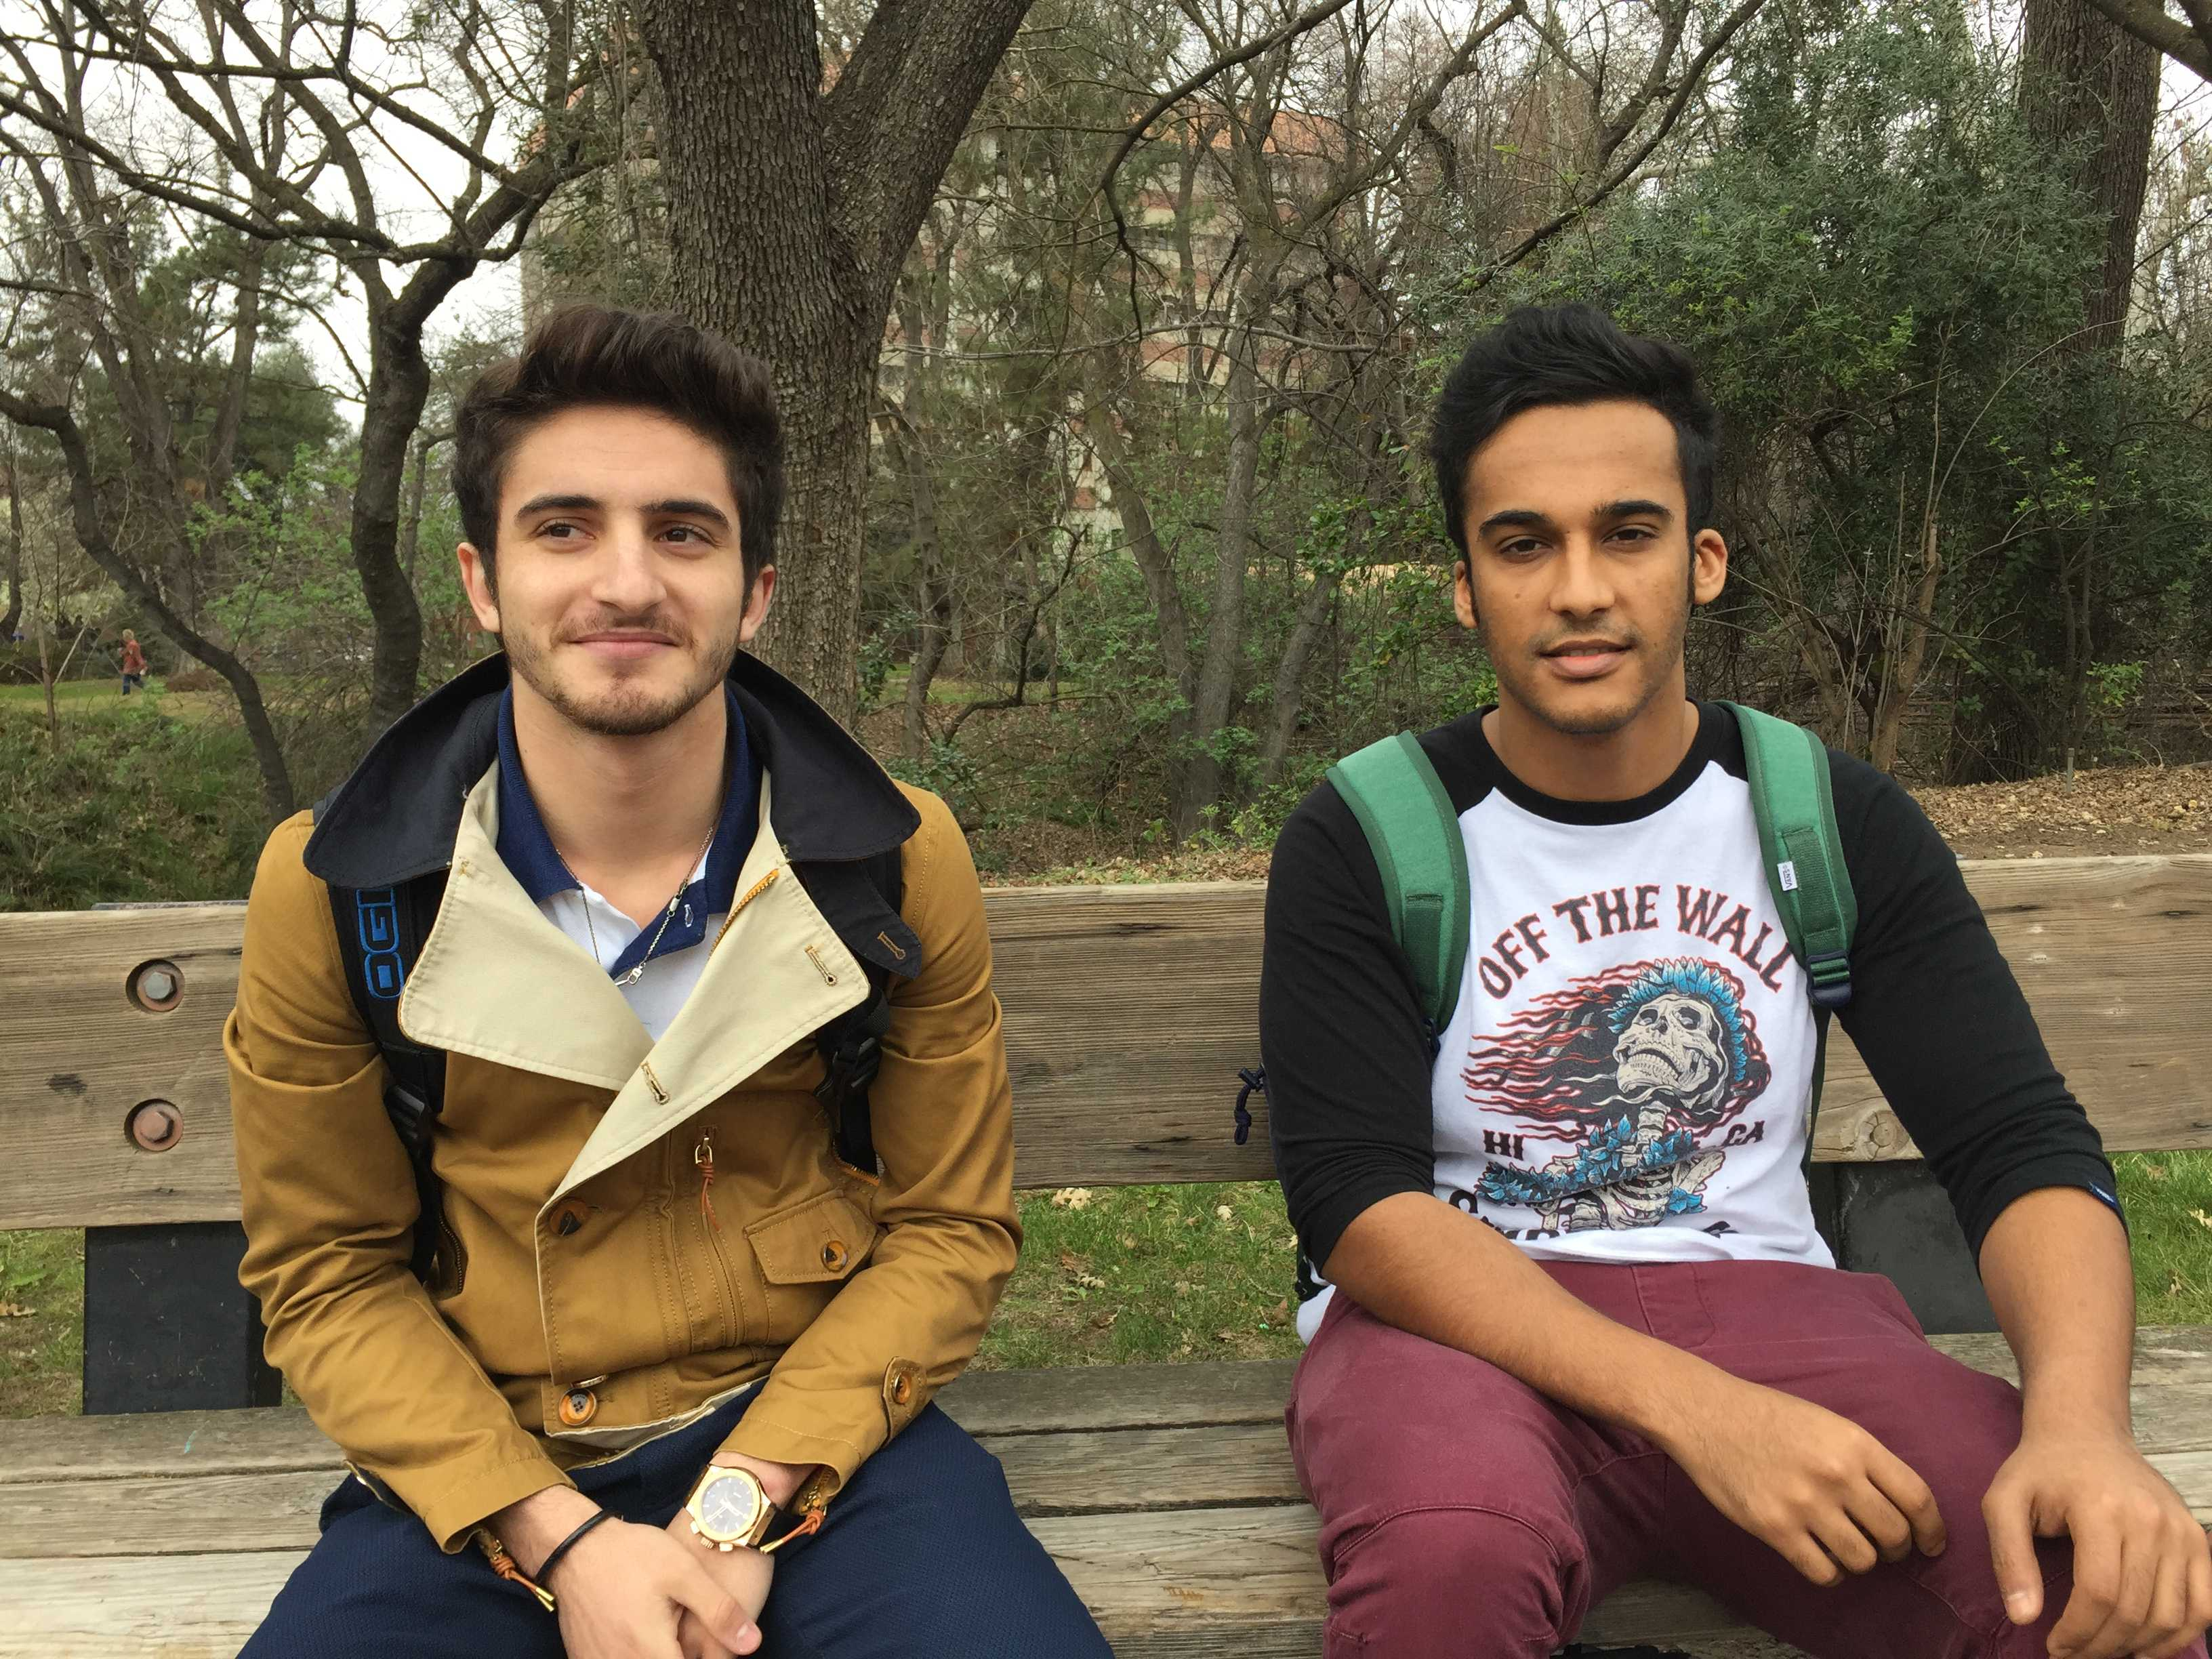 Ayman Arara and Yazeed Alsubaie, senior international relations majors Photo credit: Claire Martinez